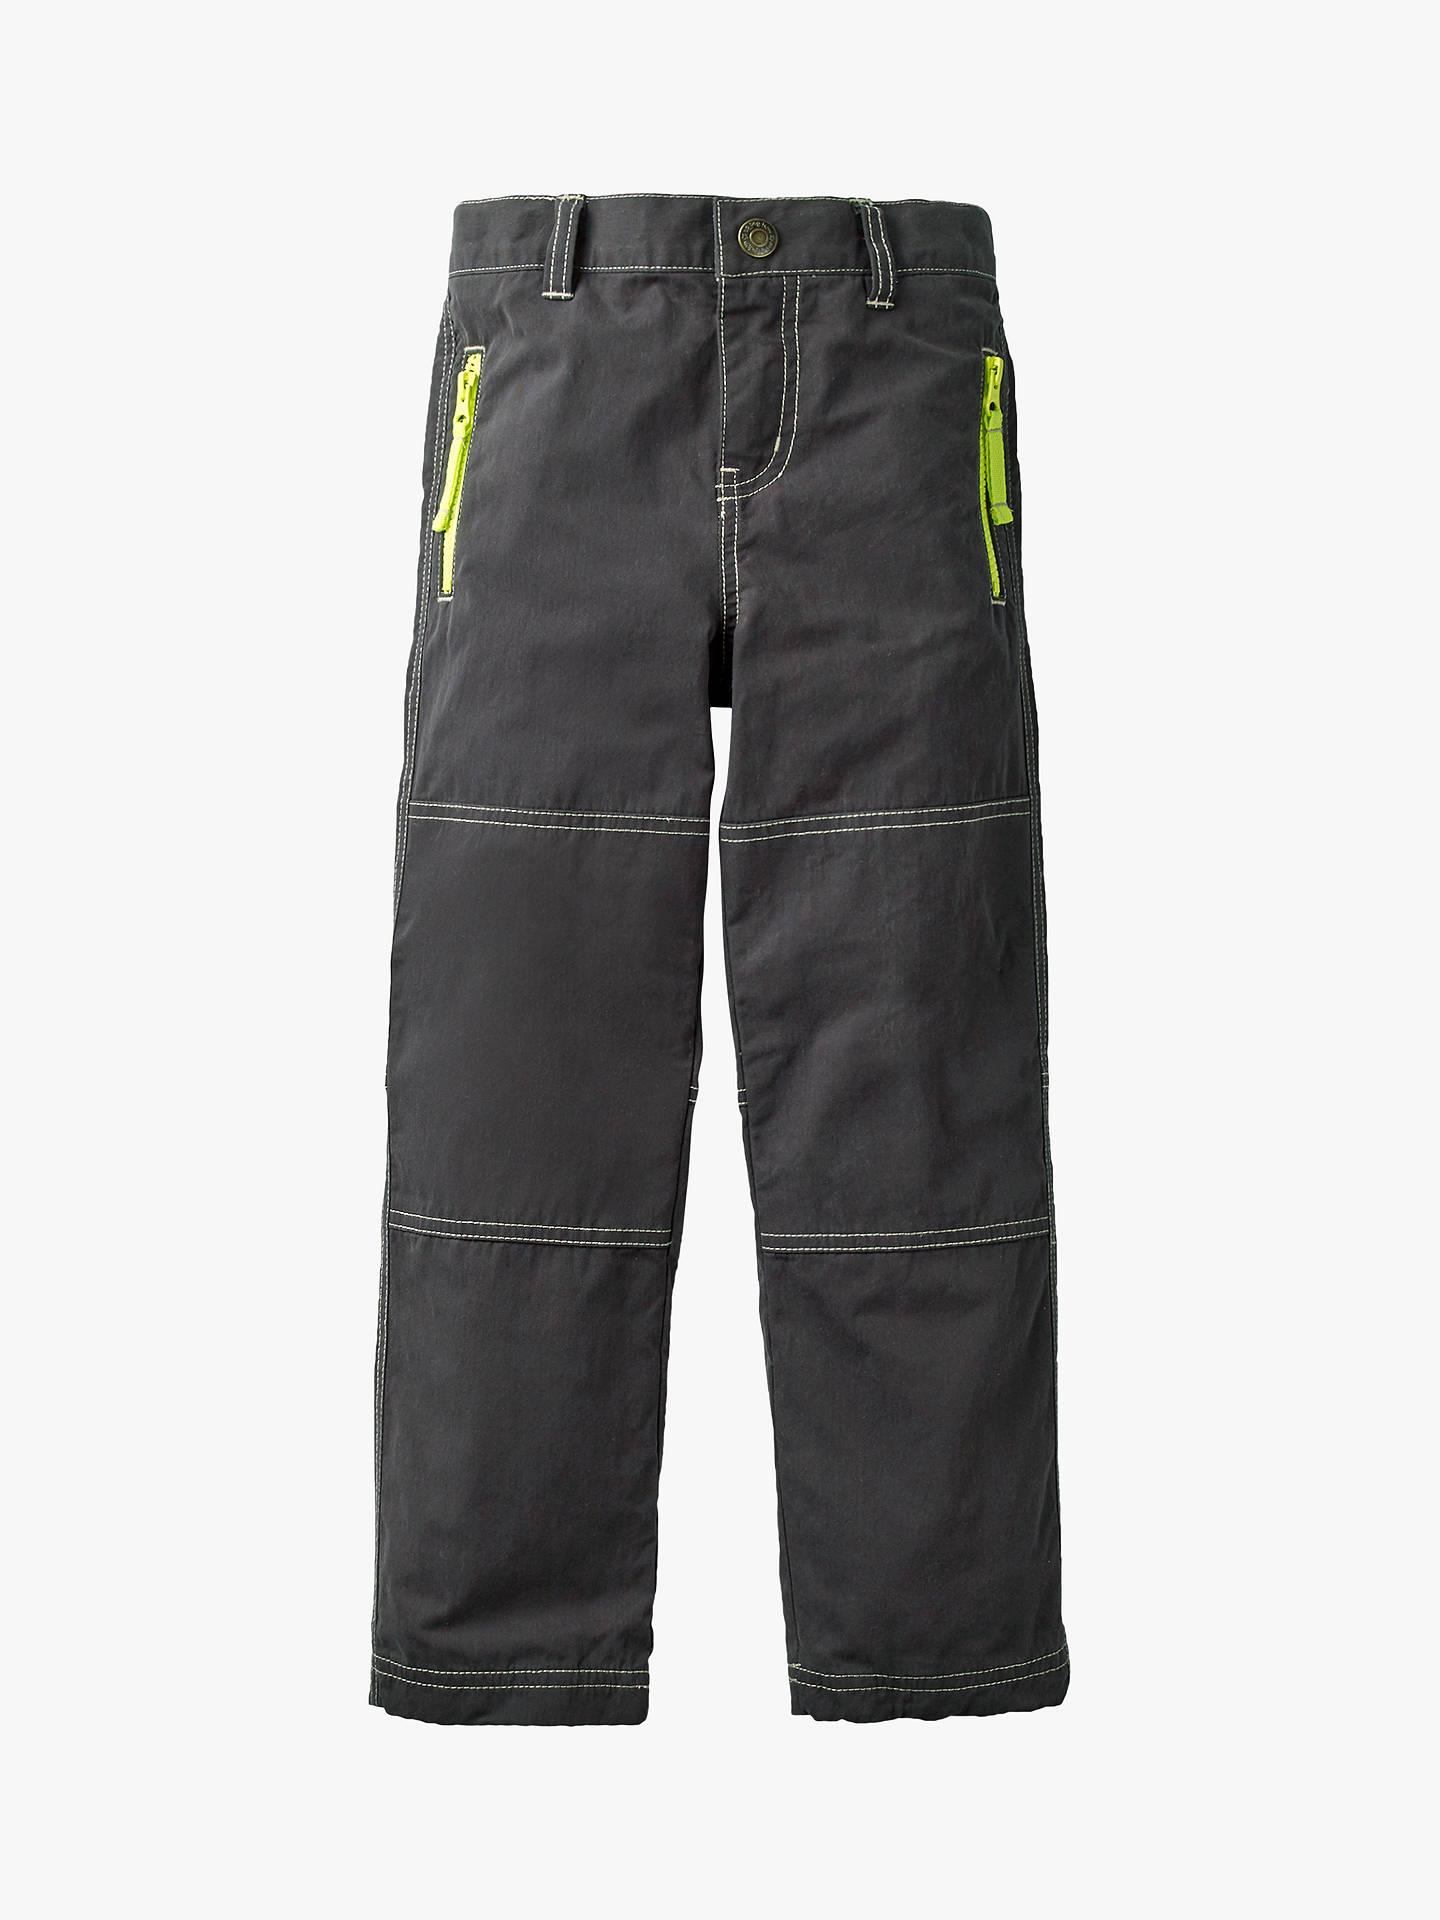 Mini Boden Boys Lined Skate Trousers Volcanic Rock Grey At John